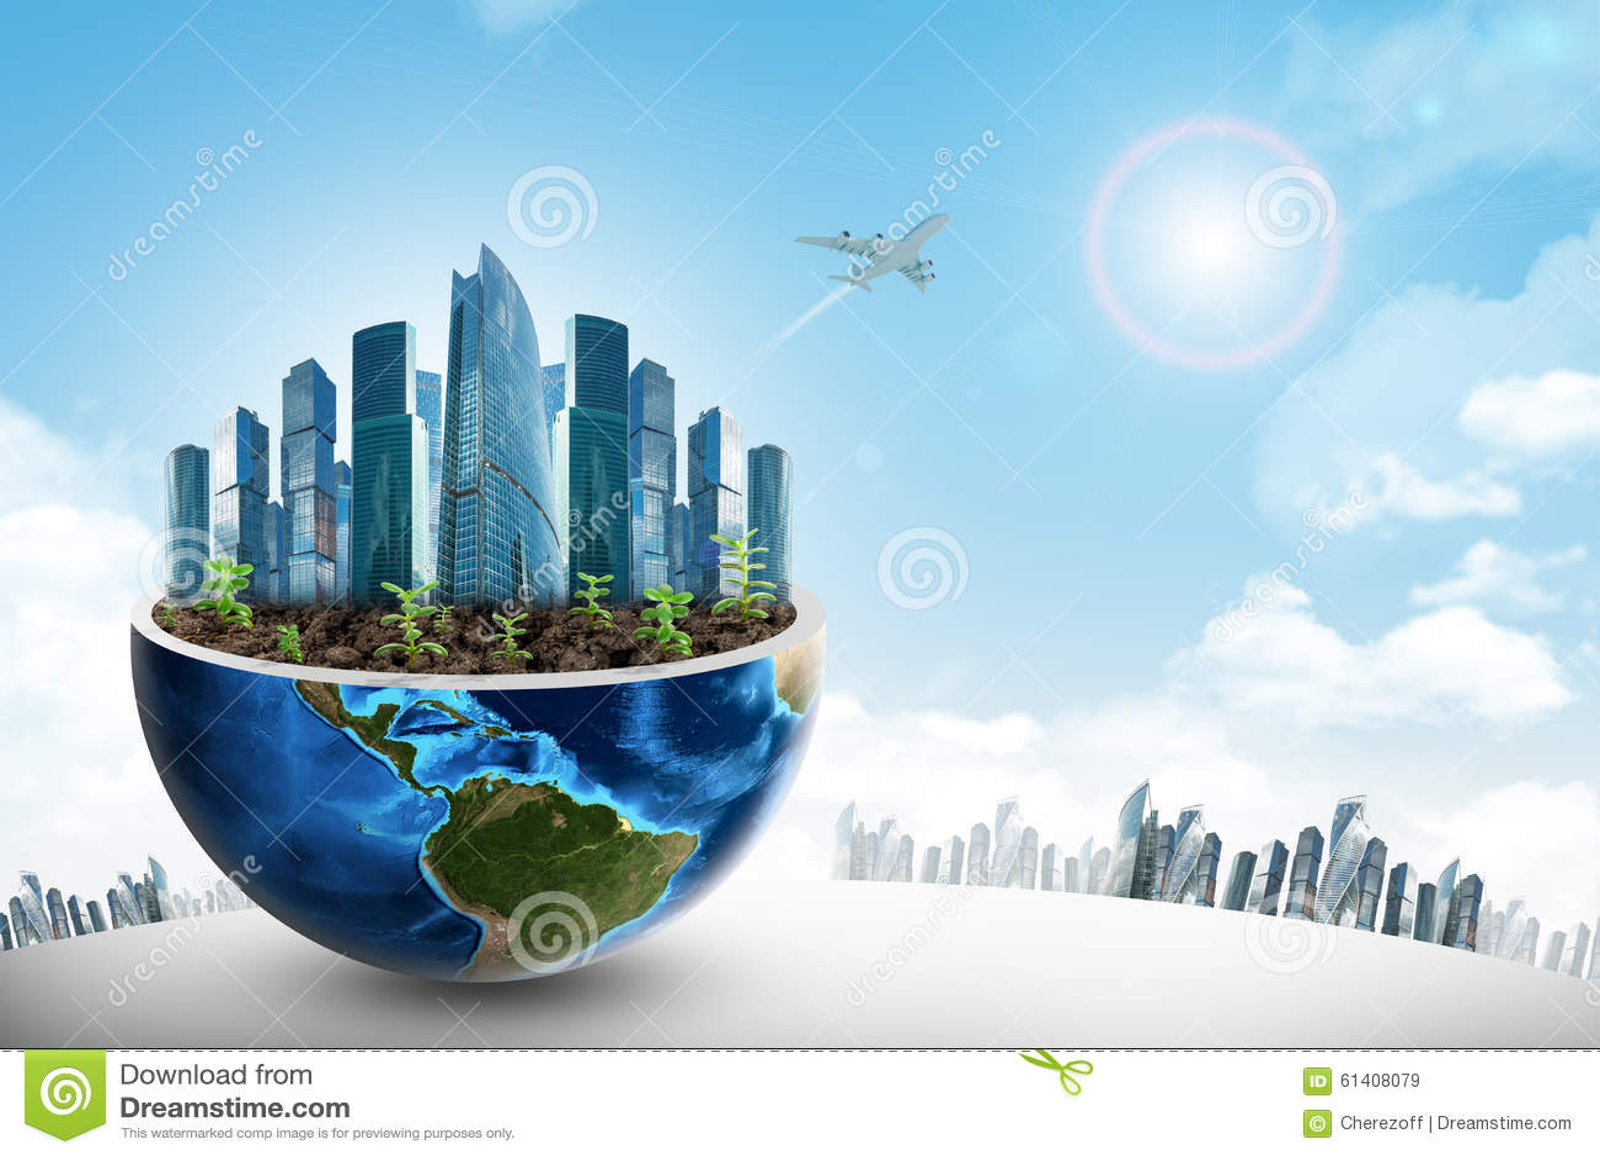 Islamic Wallpaper Hd Download Full City In Half Earth Stock Image Image Of Earth Modern